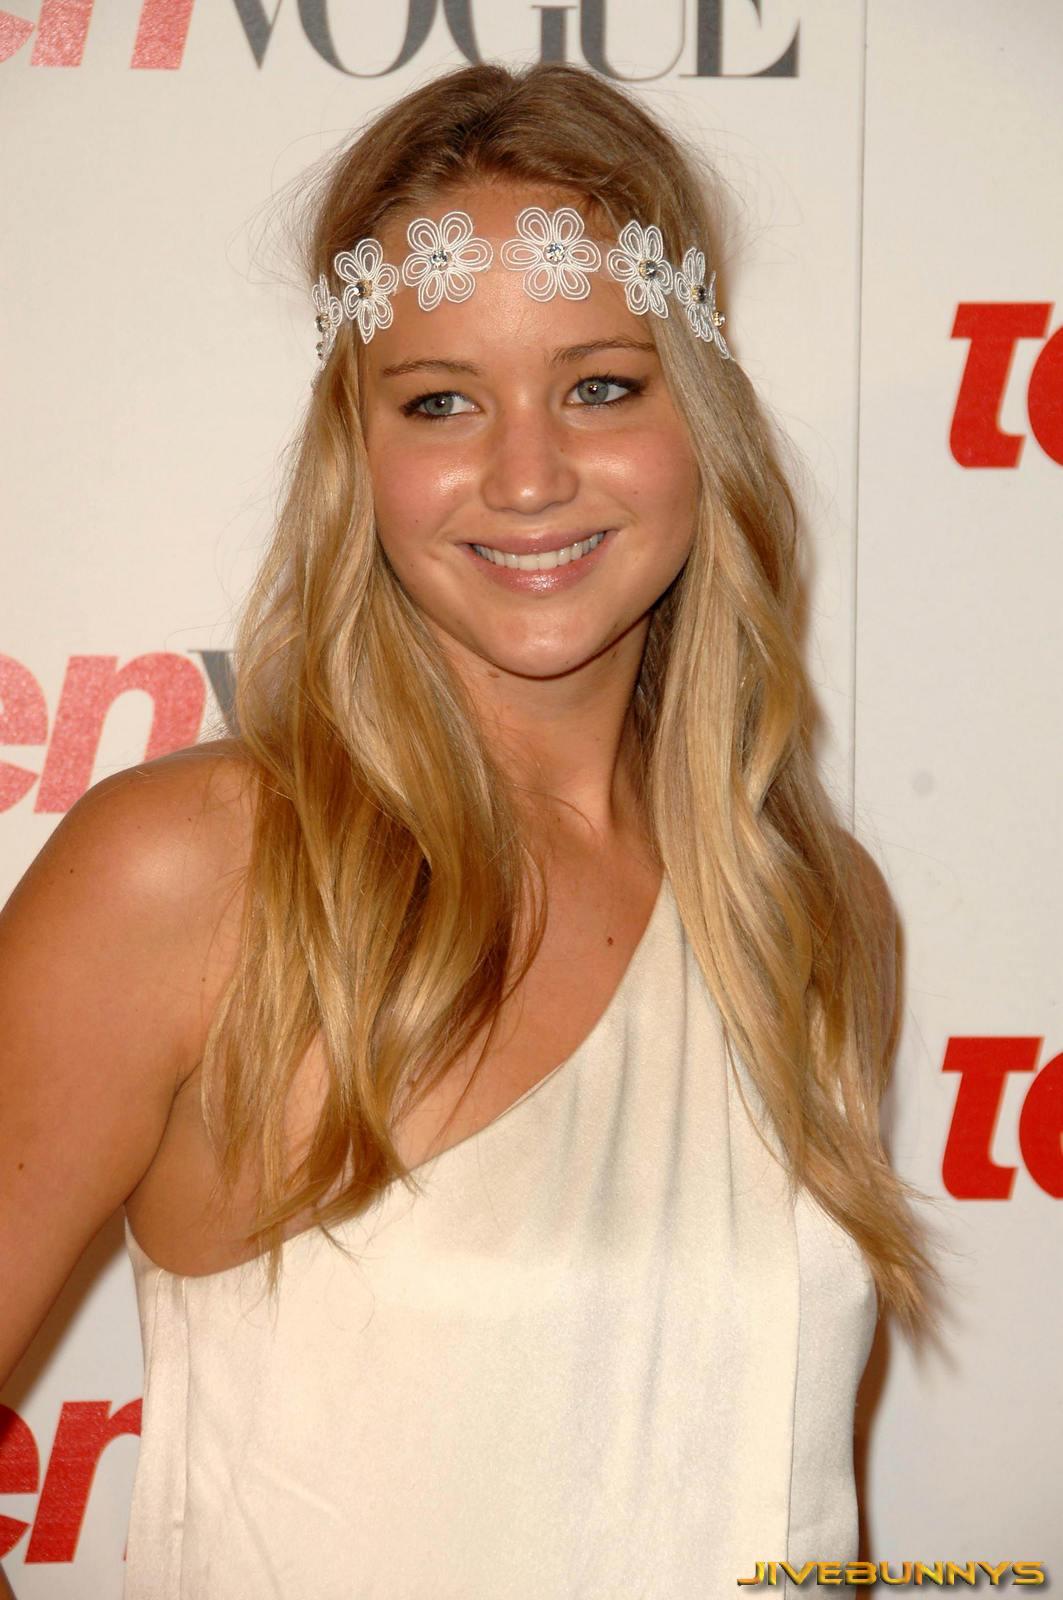 http://2.bp.blogspot.com/-6nG_t1TcPh4/T23Yna5RaYI/AAAAAAAAB24/BHzIfWM1KSI/s1600/jennifer-lawrence-actress-celebrity528.jpg